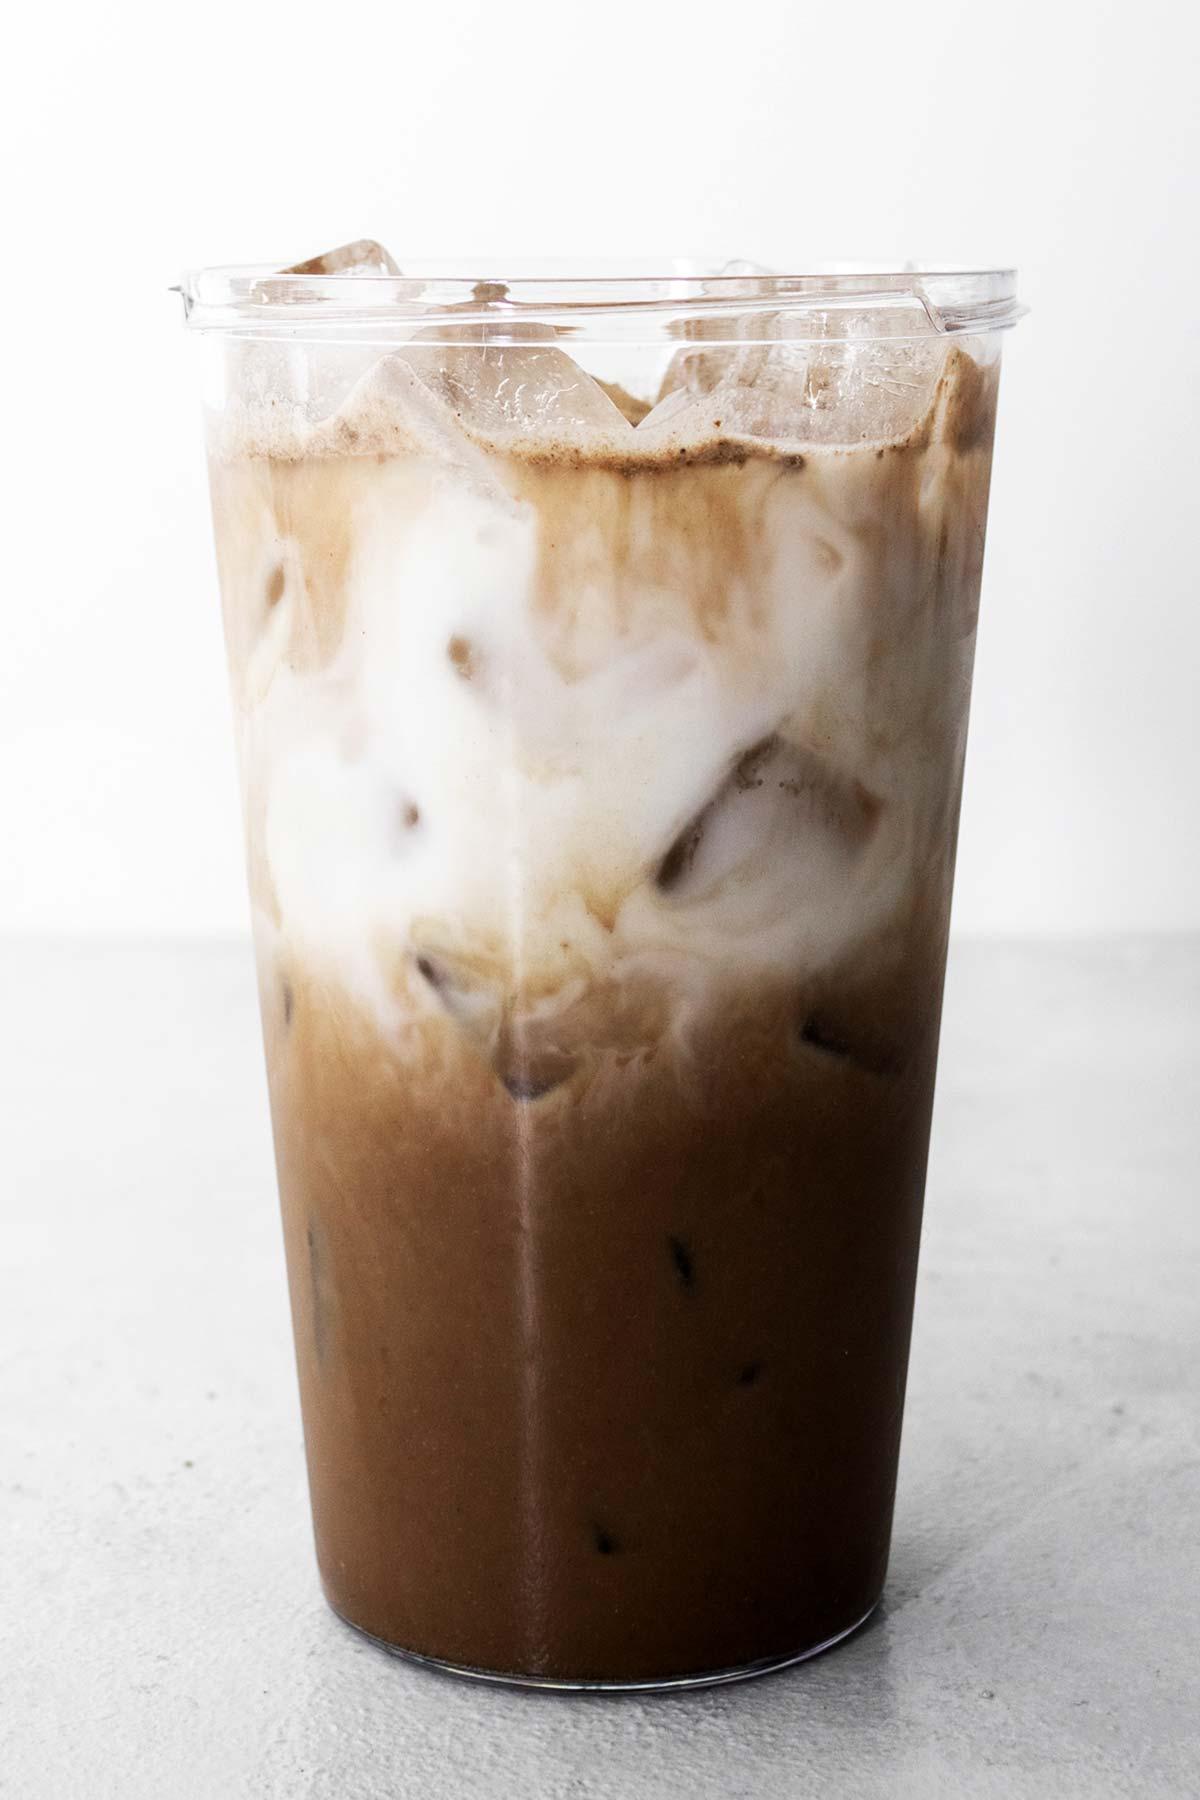 Starbucks Iced Chocolate Almondmilk Shaken Espresso Copycat drink in a cup.